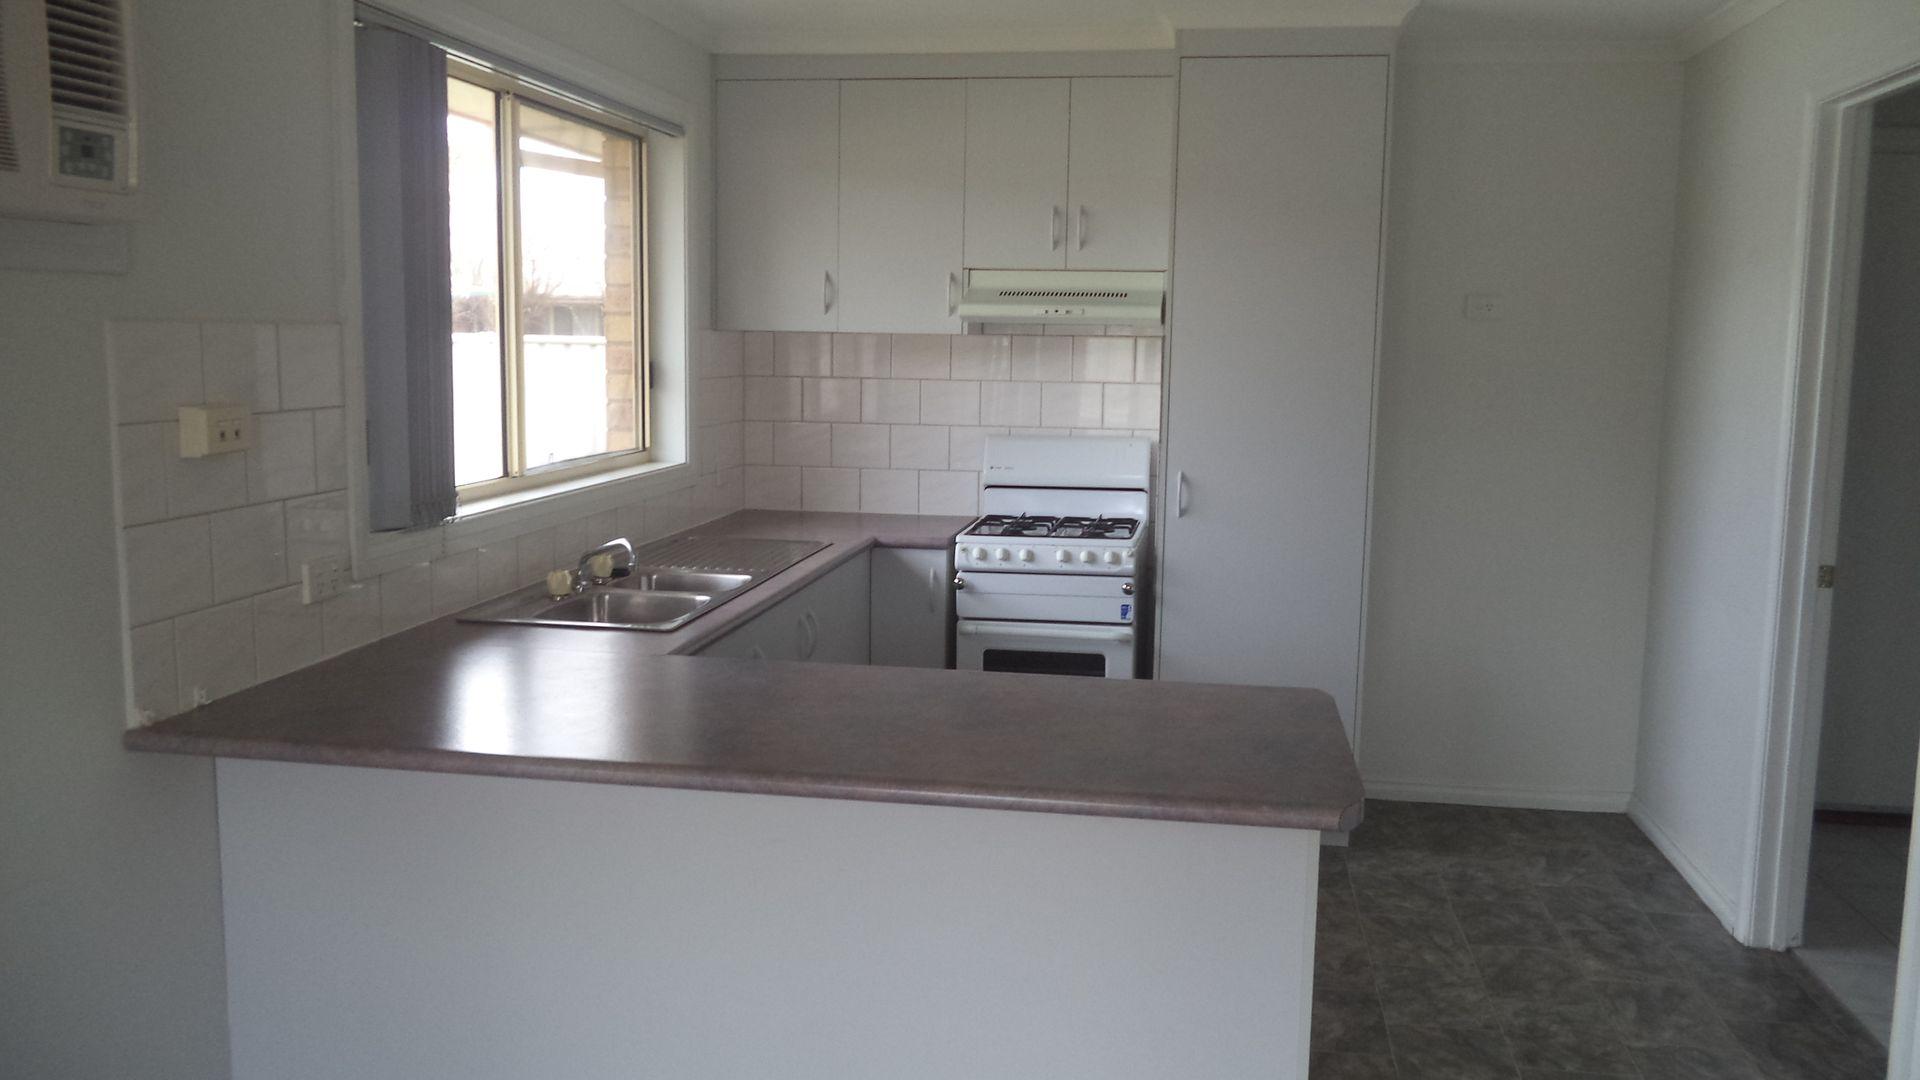 11 Callander Court, Moama NSW 2731, Image 2